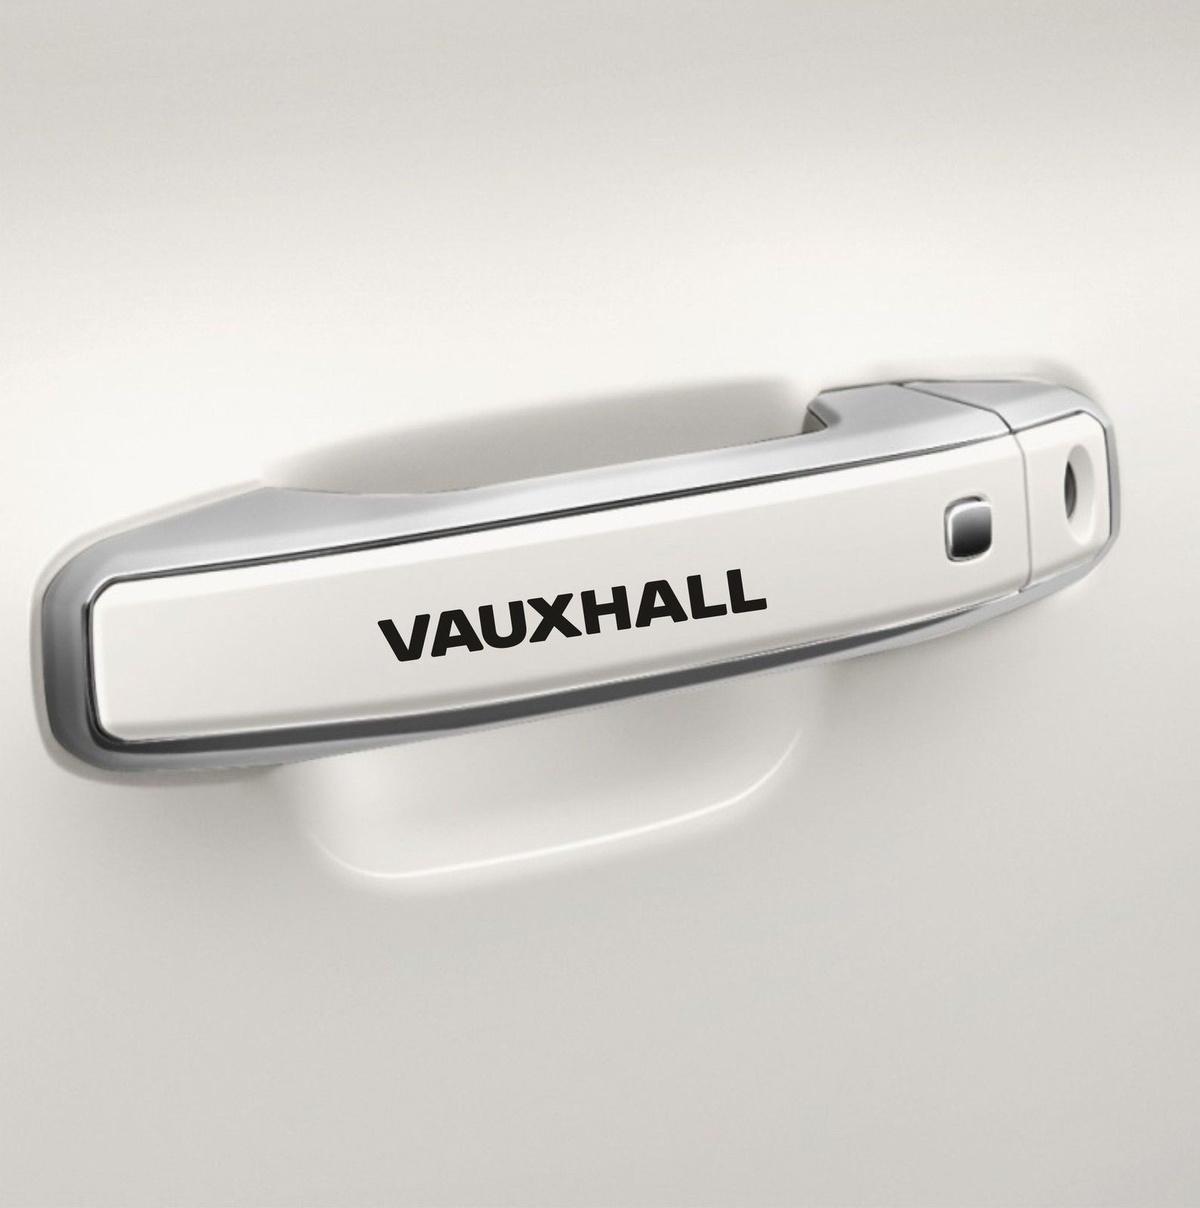 8x For Car Door Handle Sticker fits Vauxhall Sticker Car Body-wear Vinyl N71